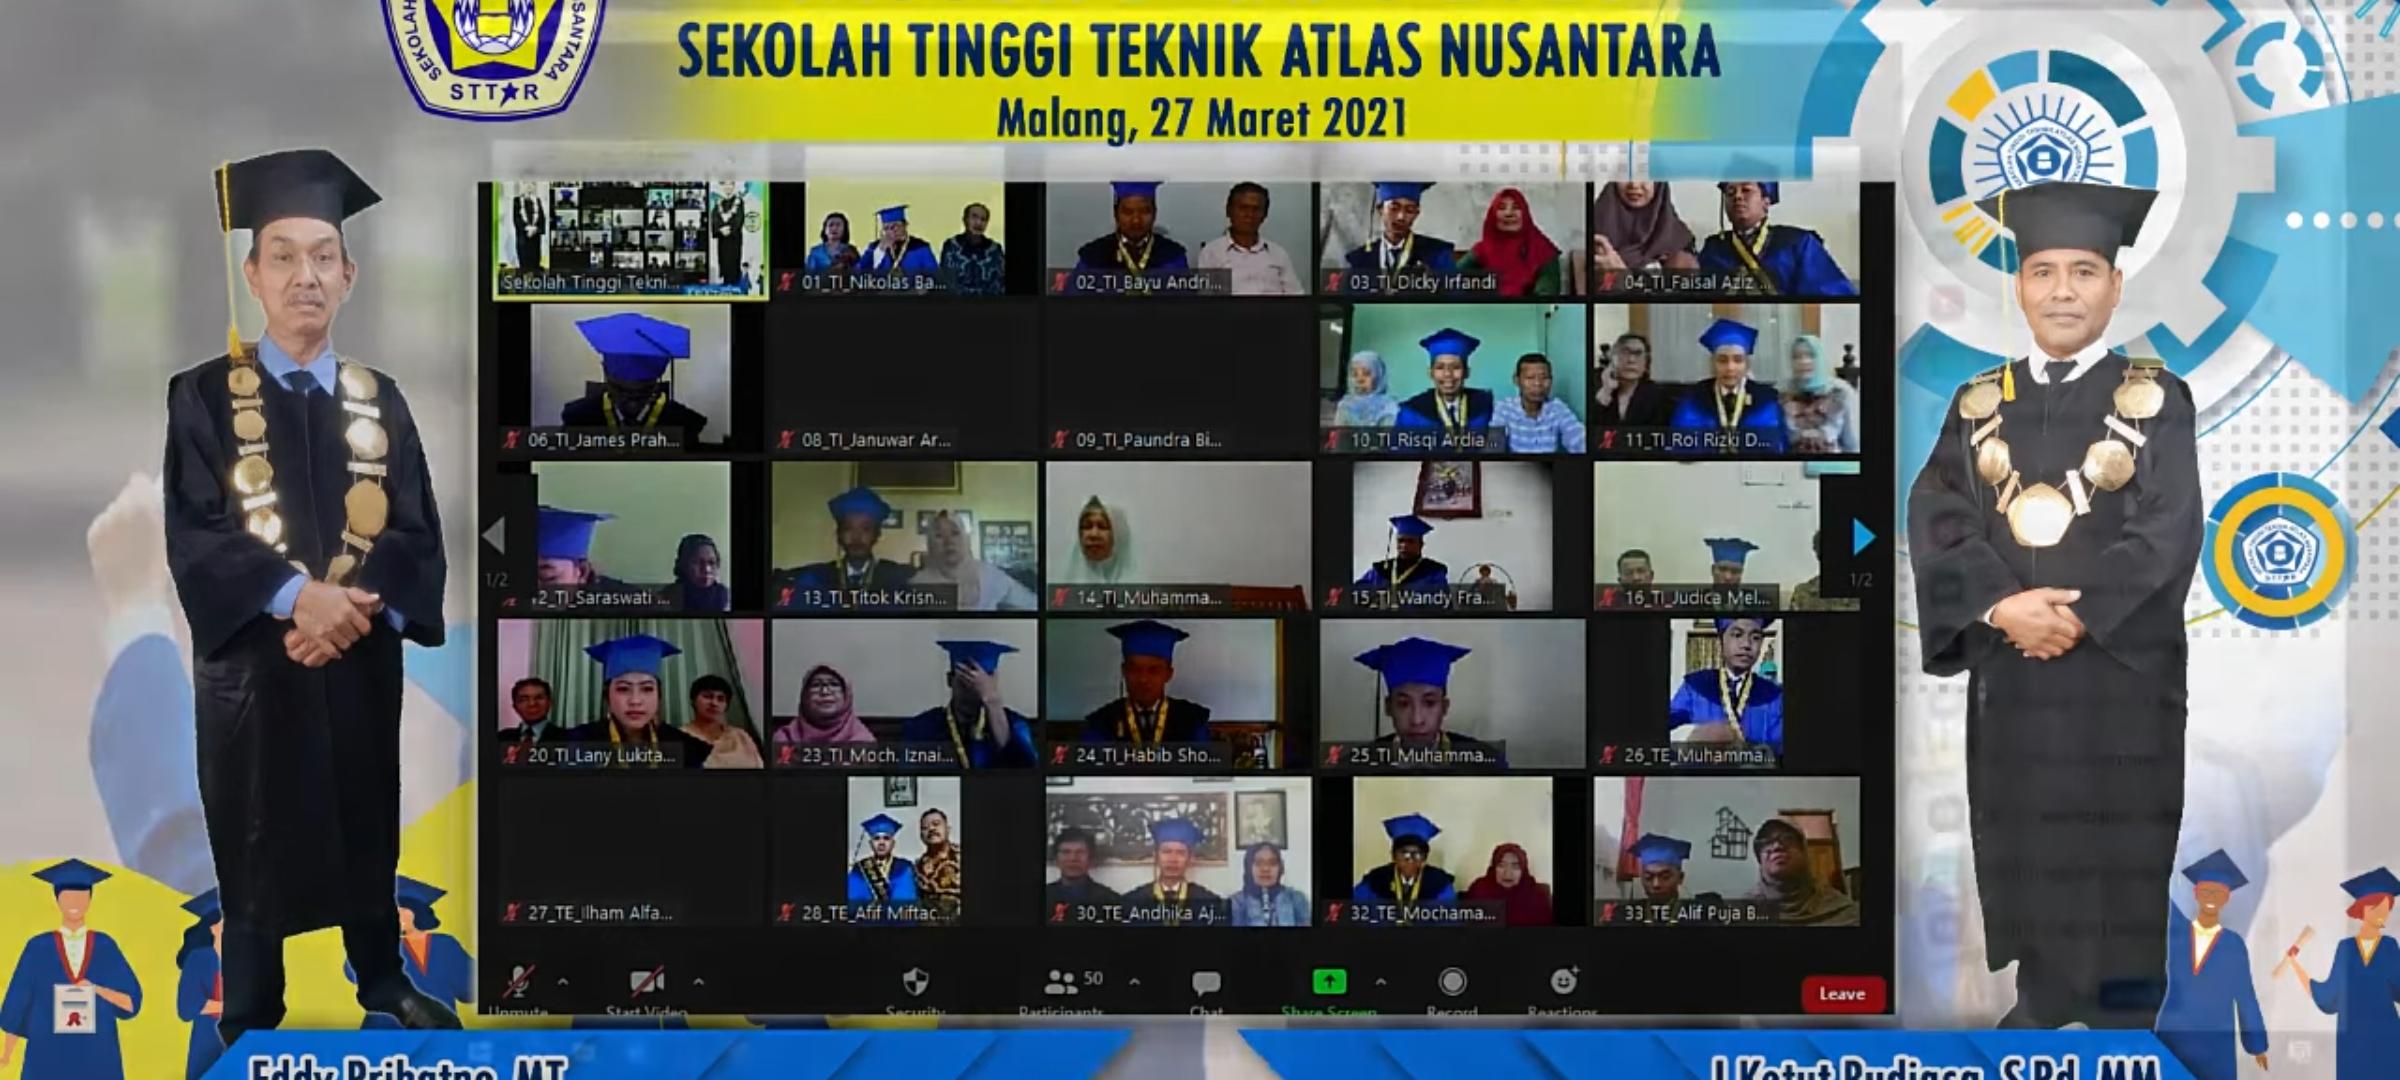 Wisuda Daring Sekolah Tinggi Teknik Atlas Nusantara Tahun 2021